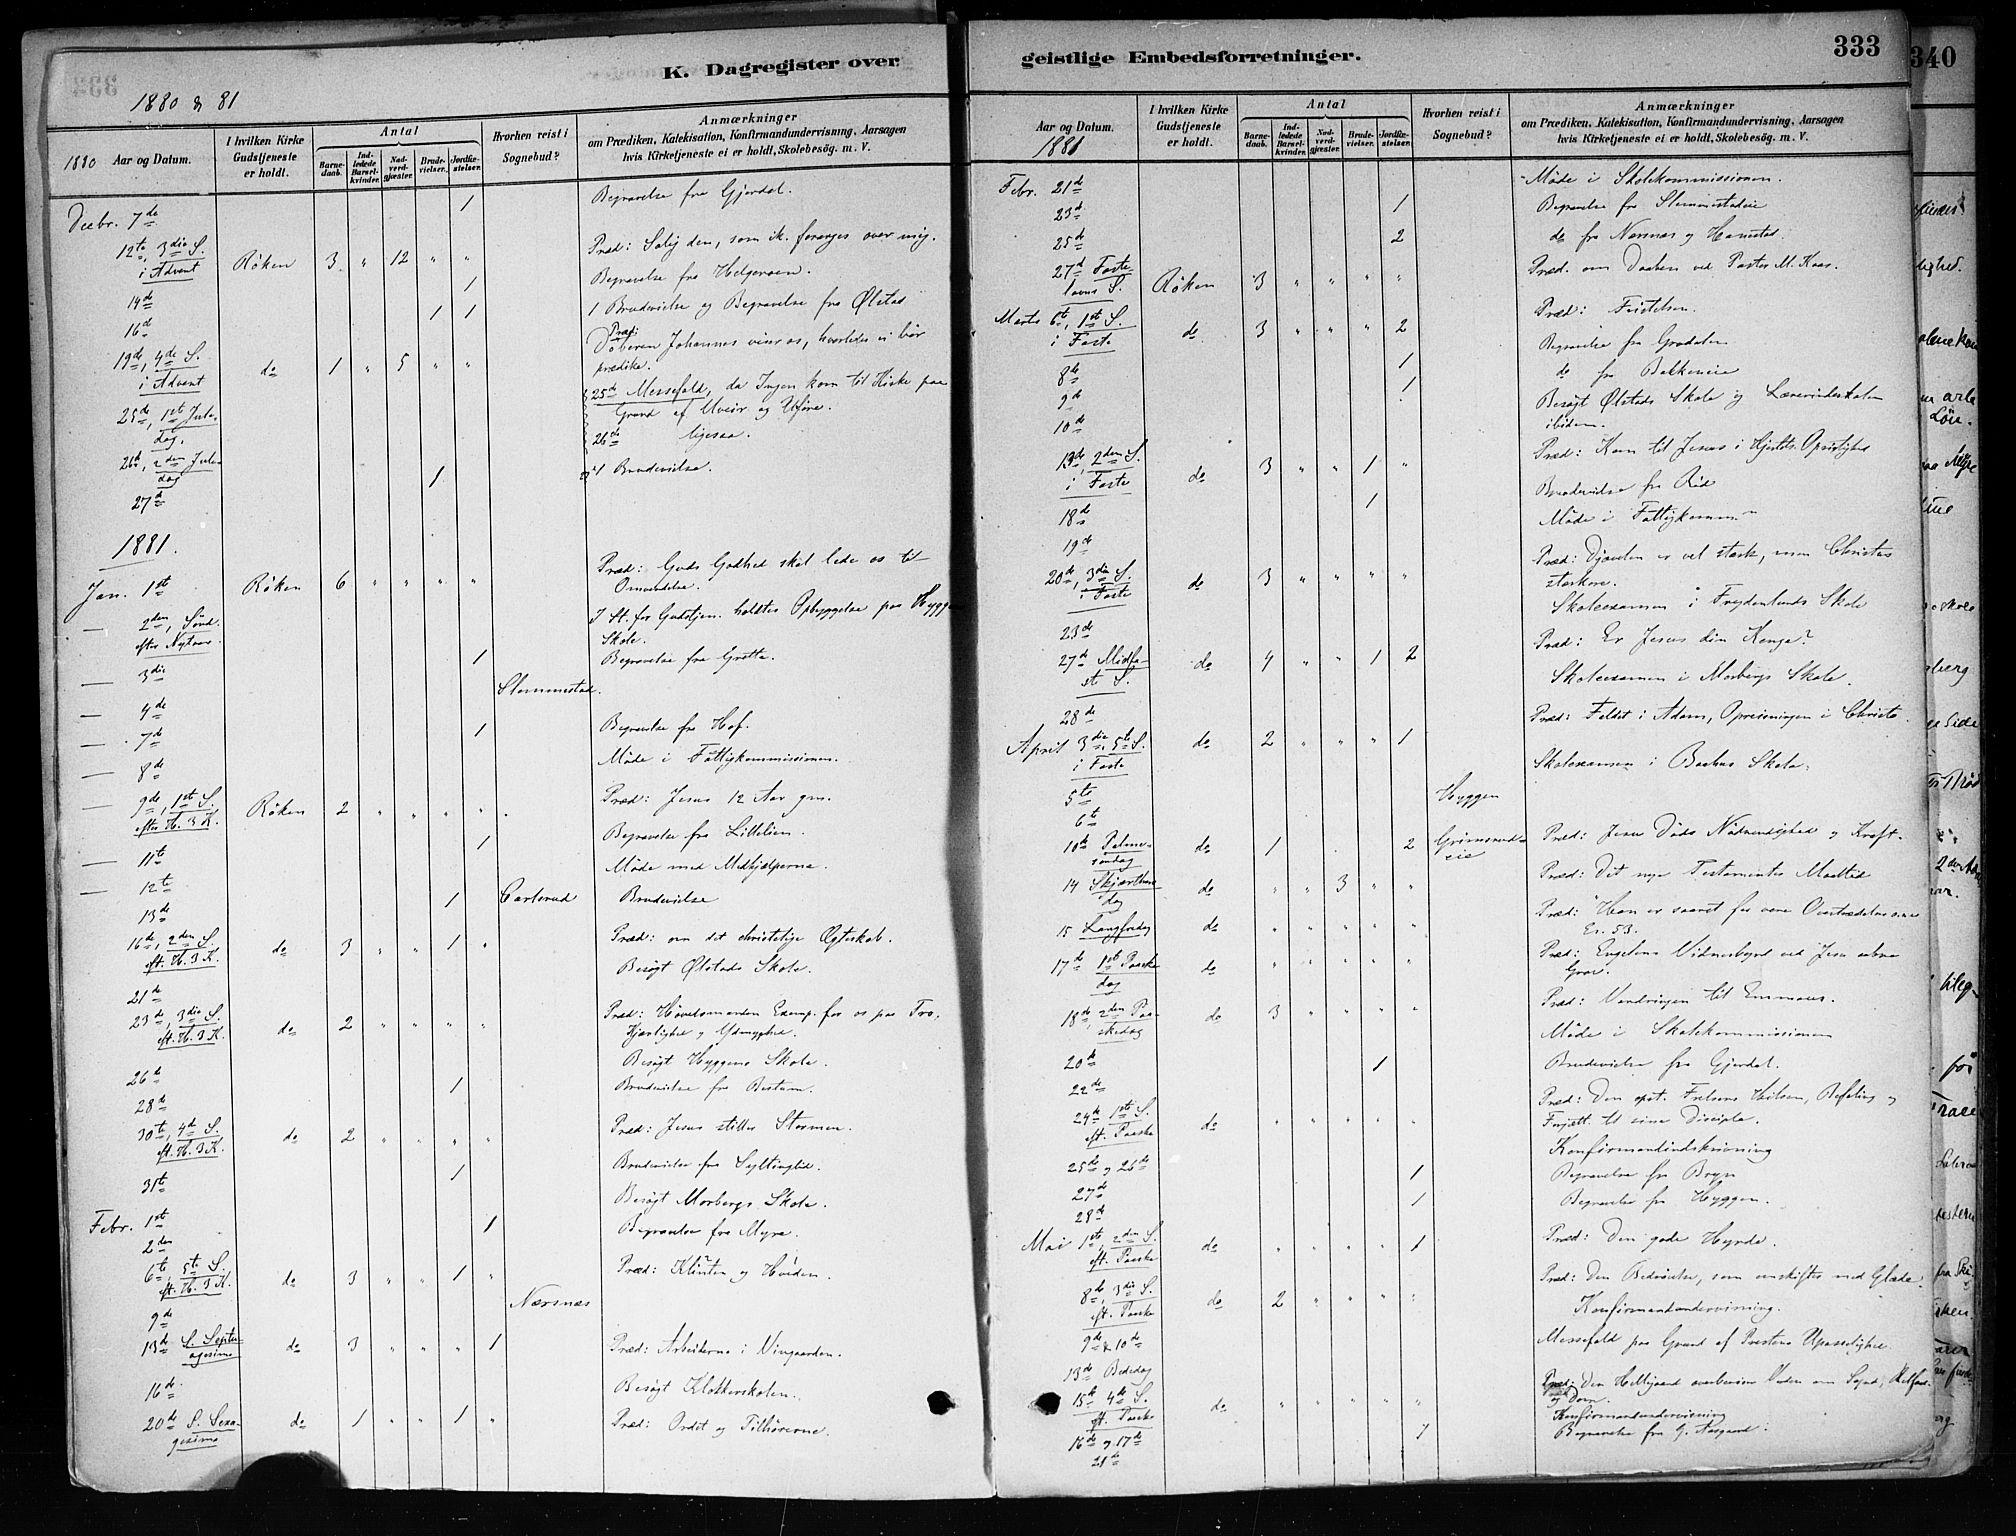 SAKO, Røyken kirkebøker, F/Fa/L0008: Parish register (official) no. 8, 1880-1897, p. 333